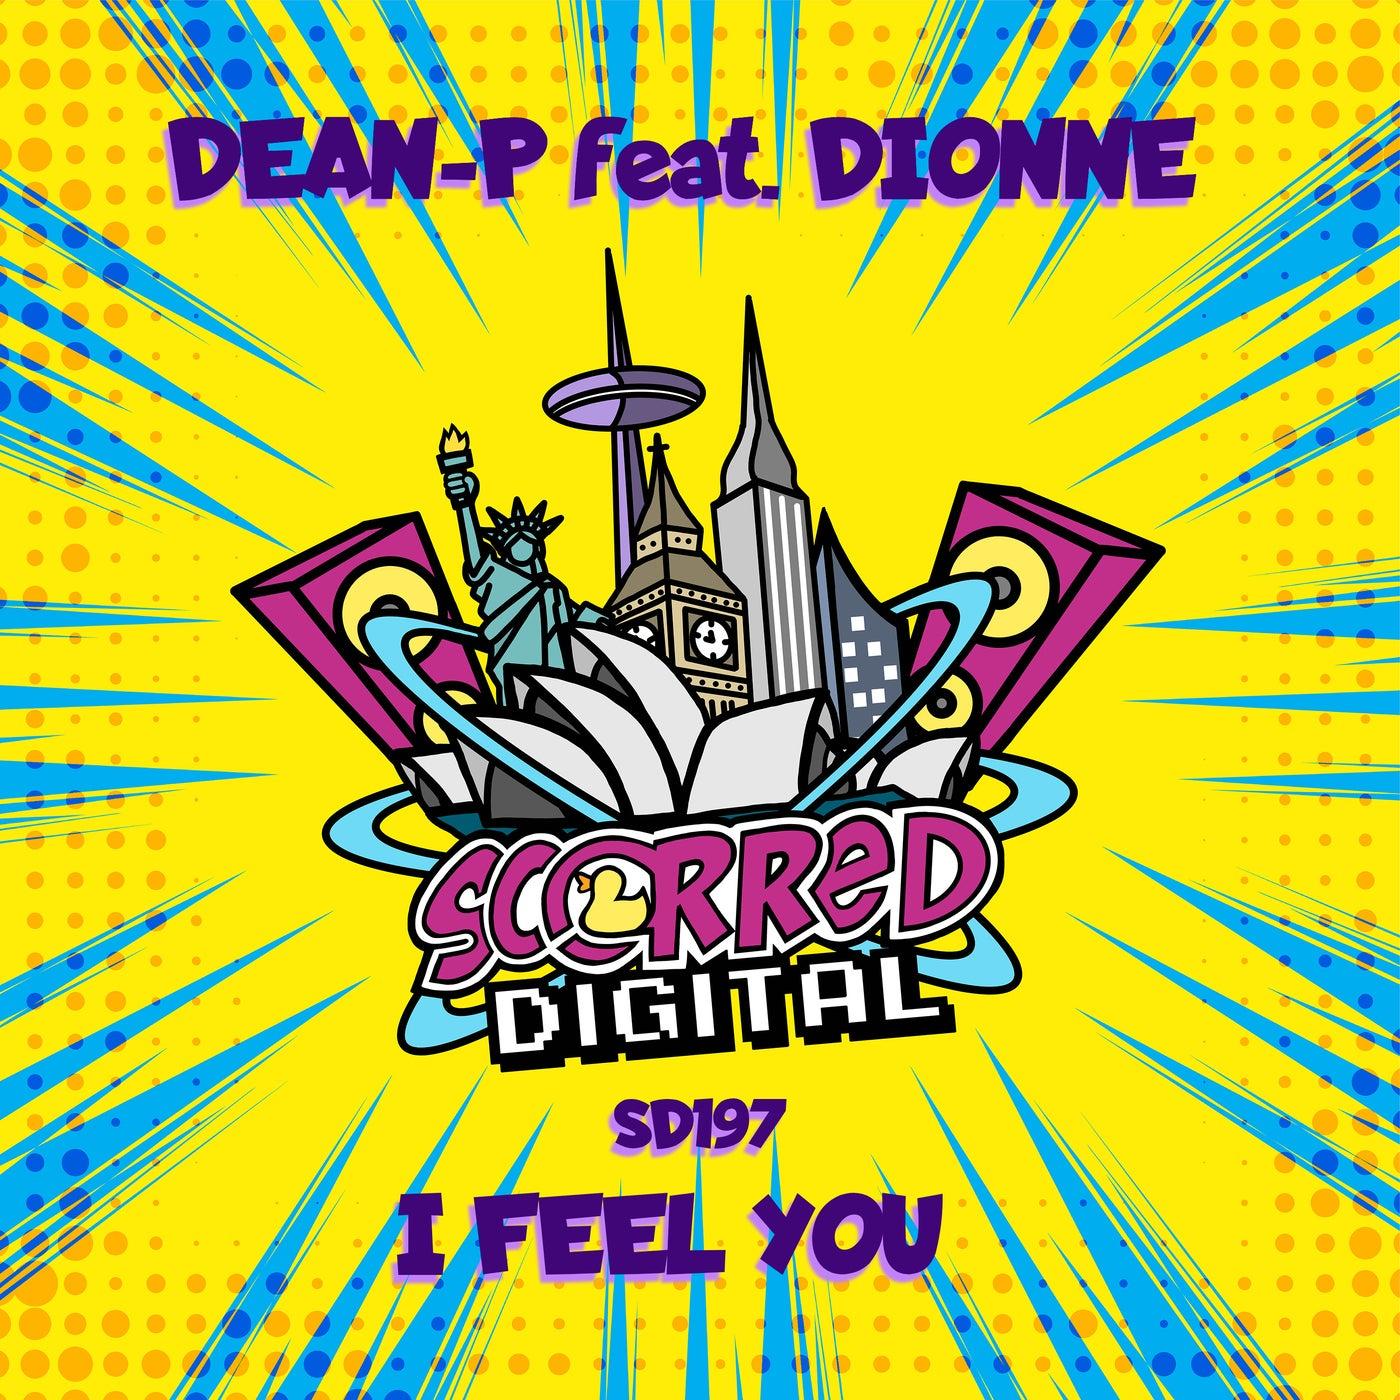 I Feel You (Original Mix)